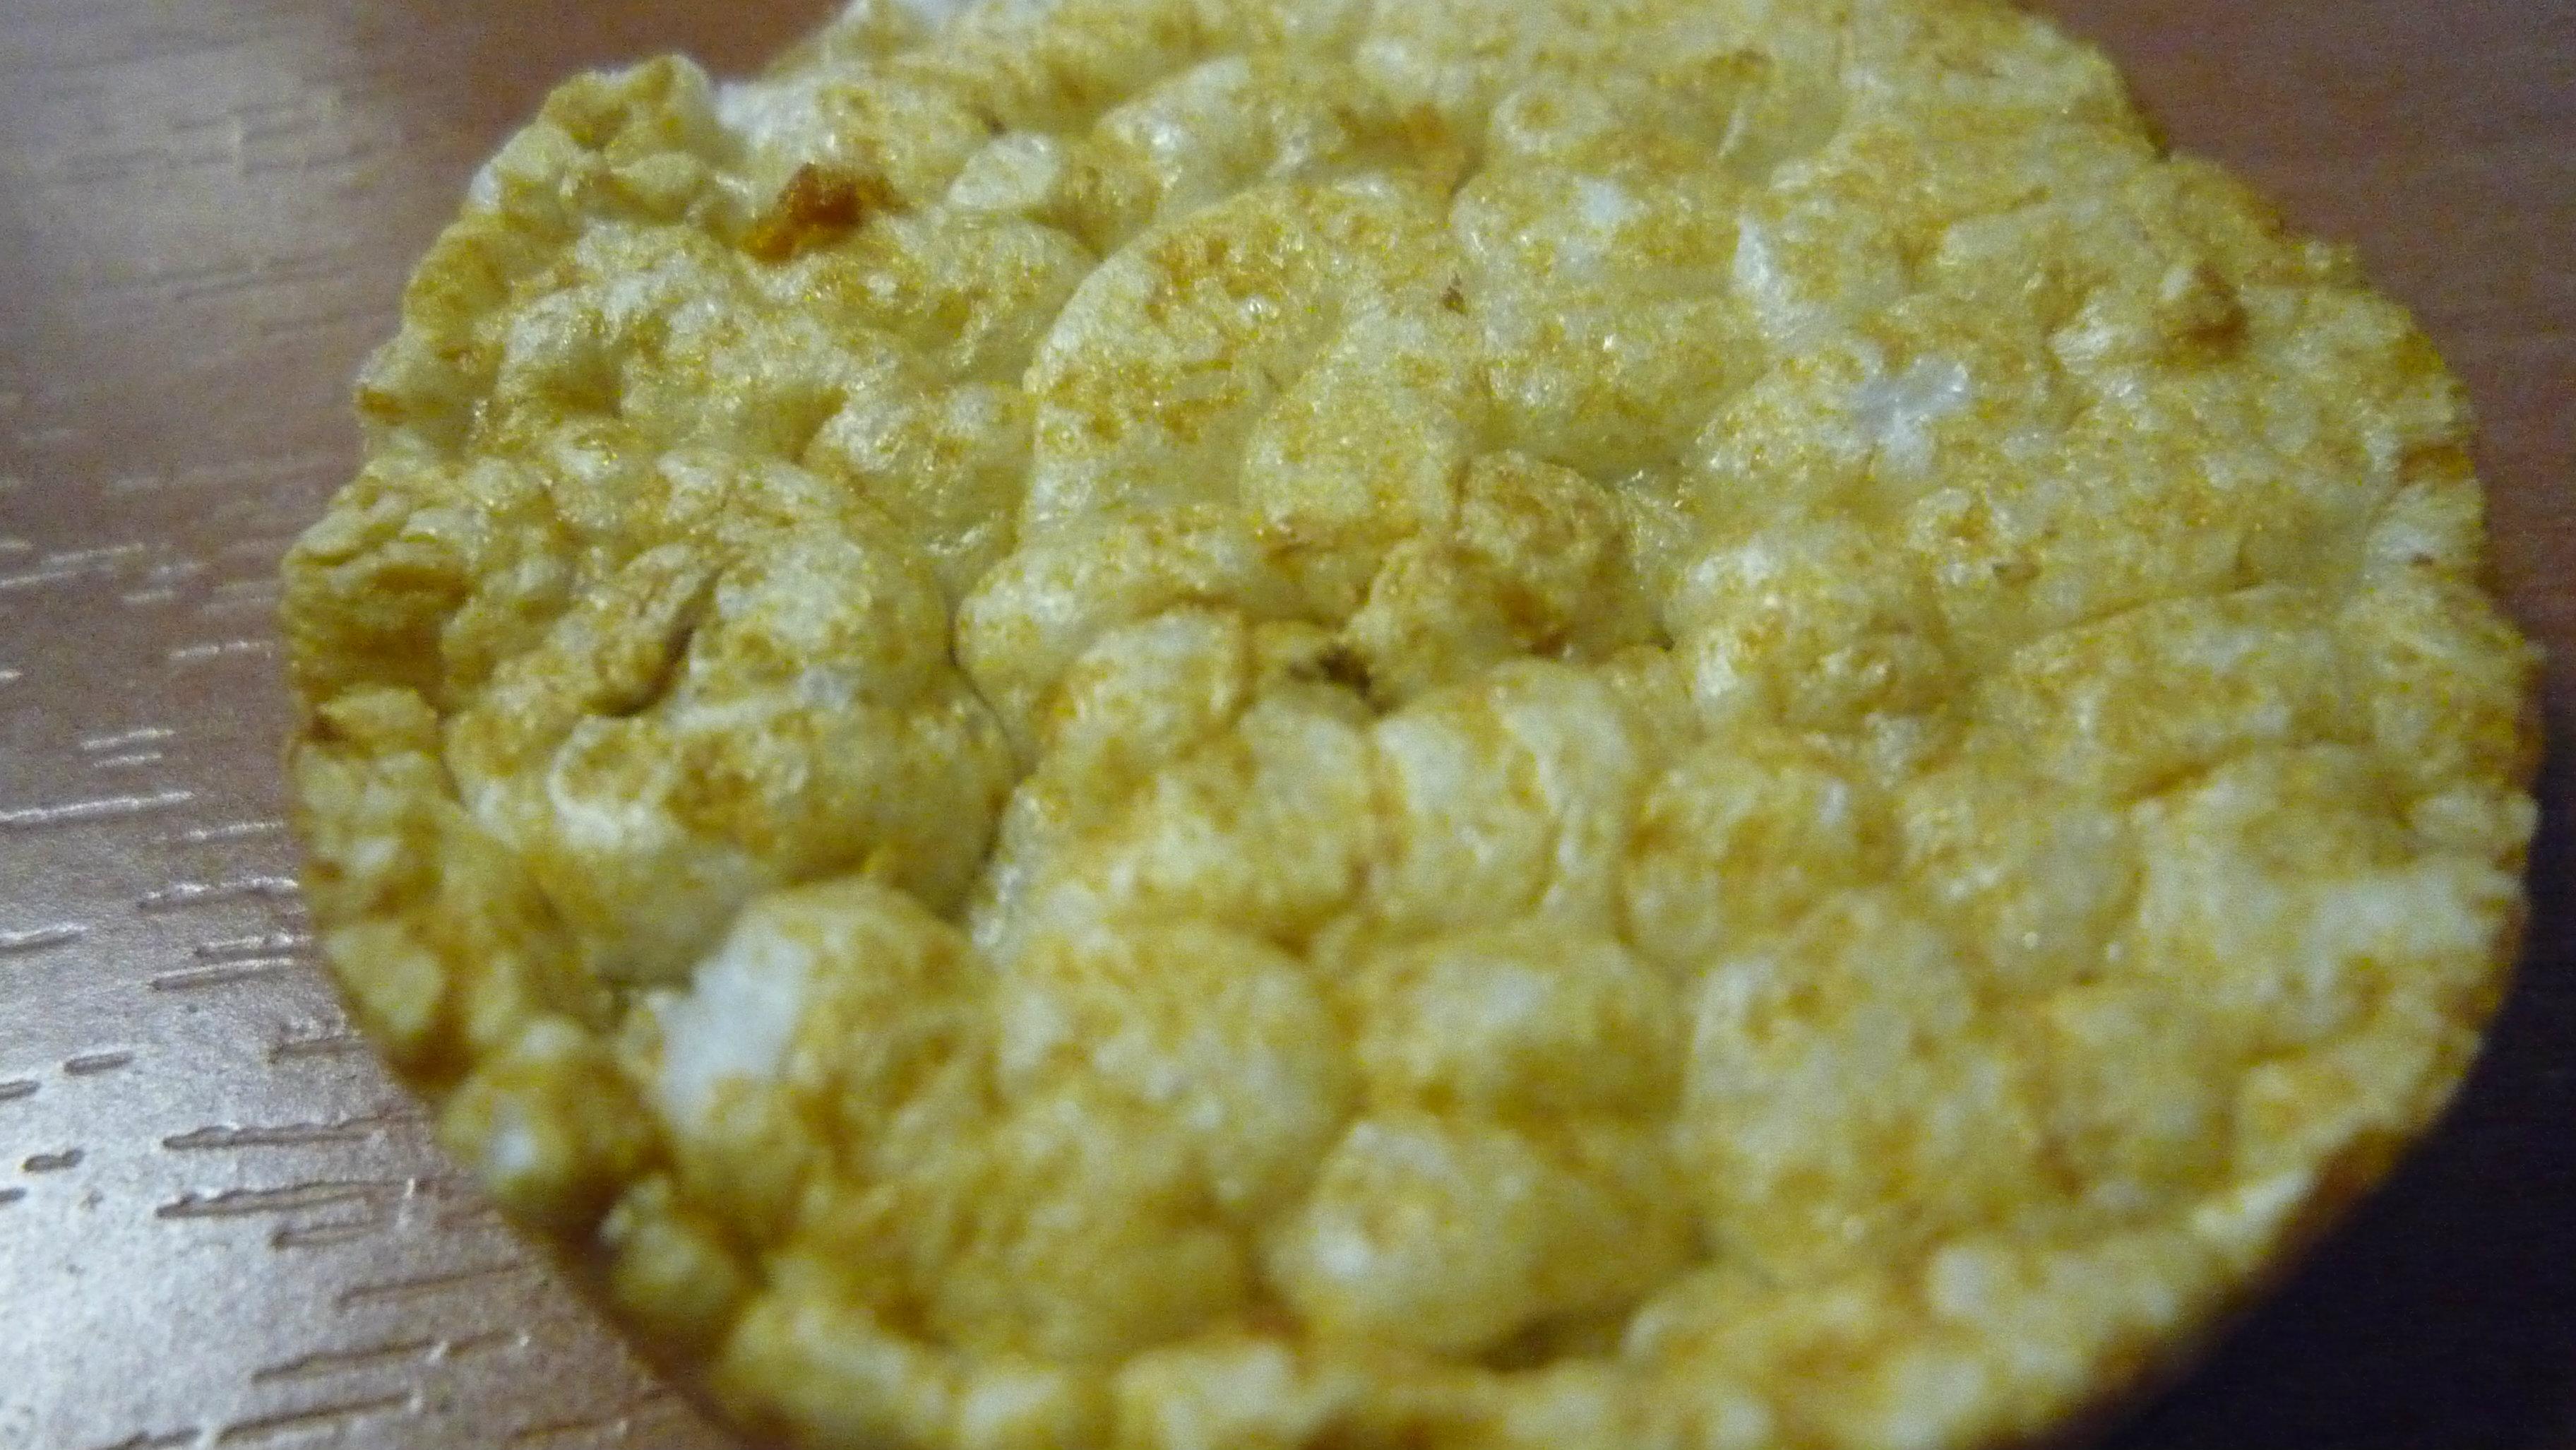 rice-cake-arsenic-germany-children